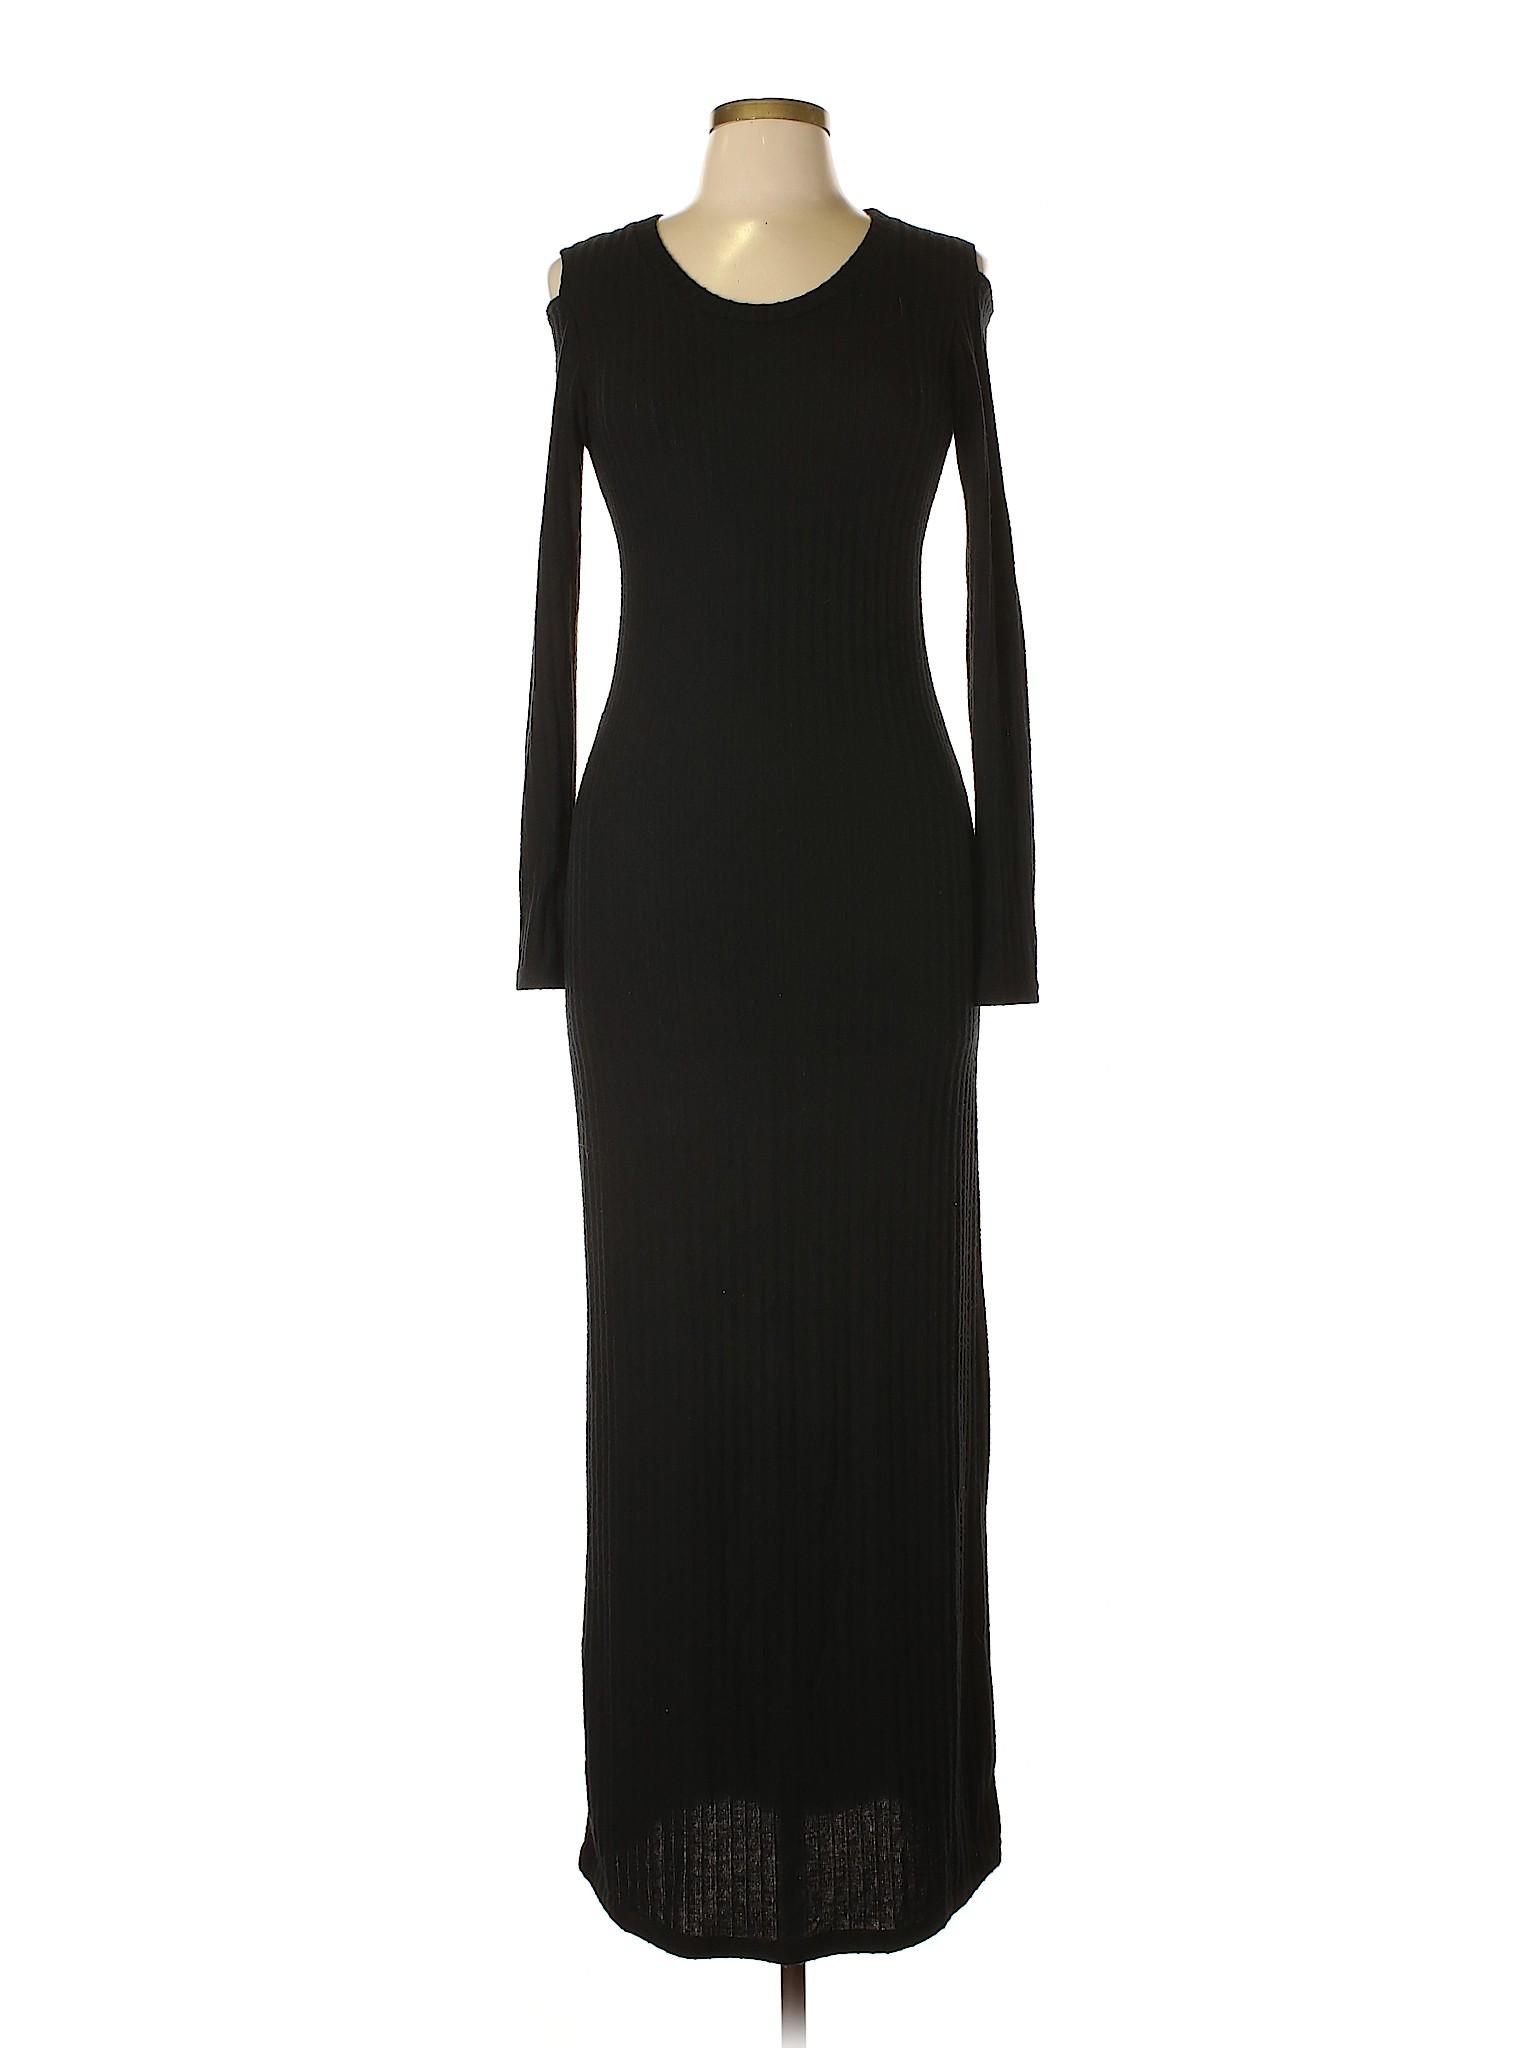 Dress Casual Coin winter Boutique 1804 nCItnpq